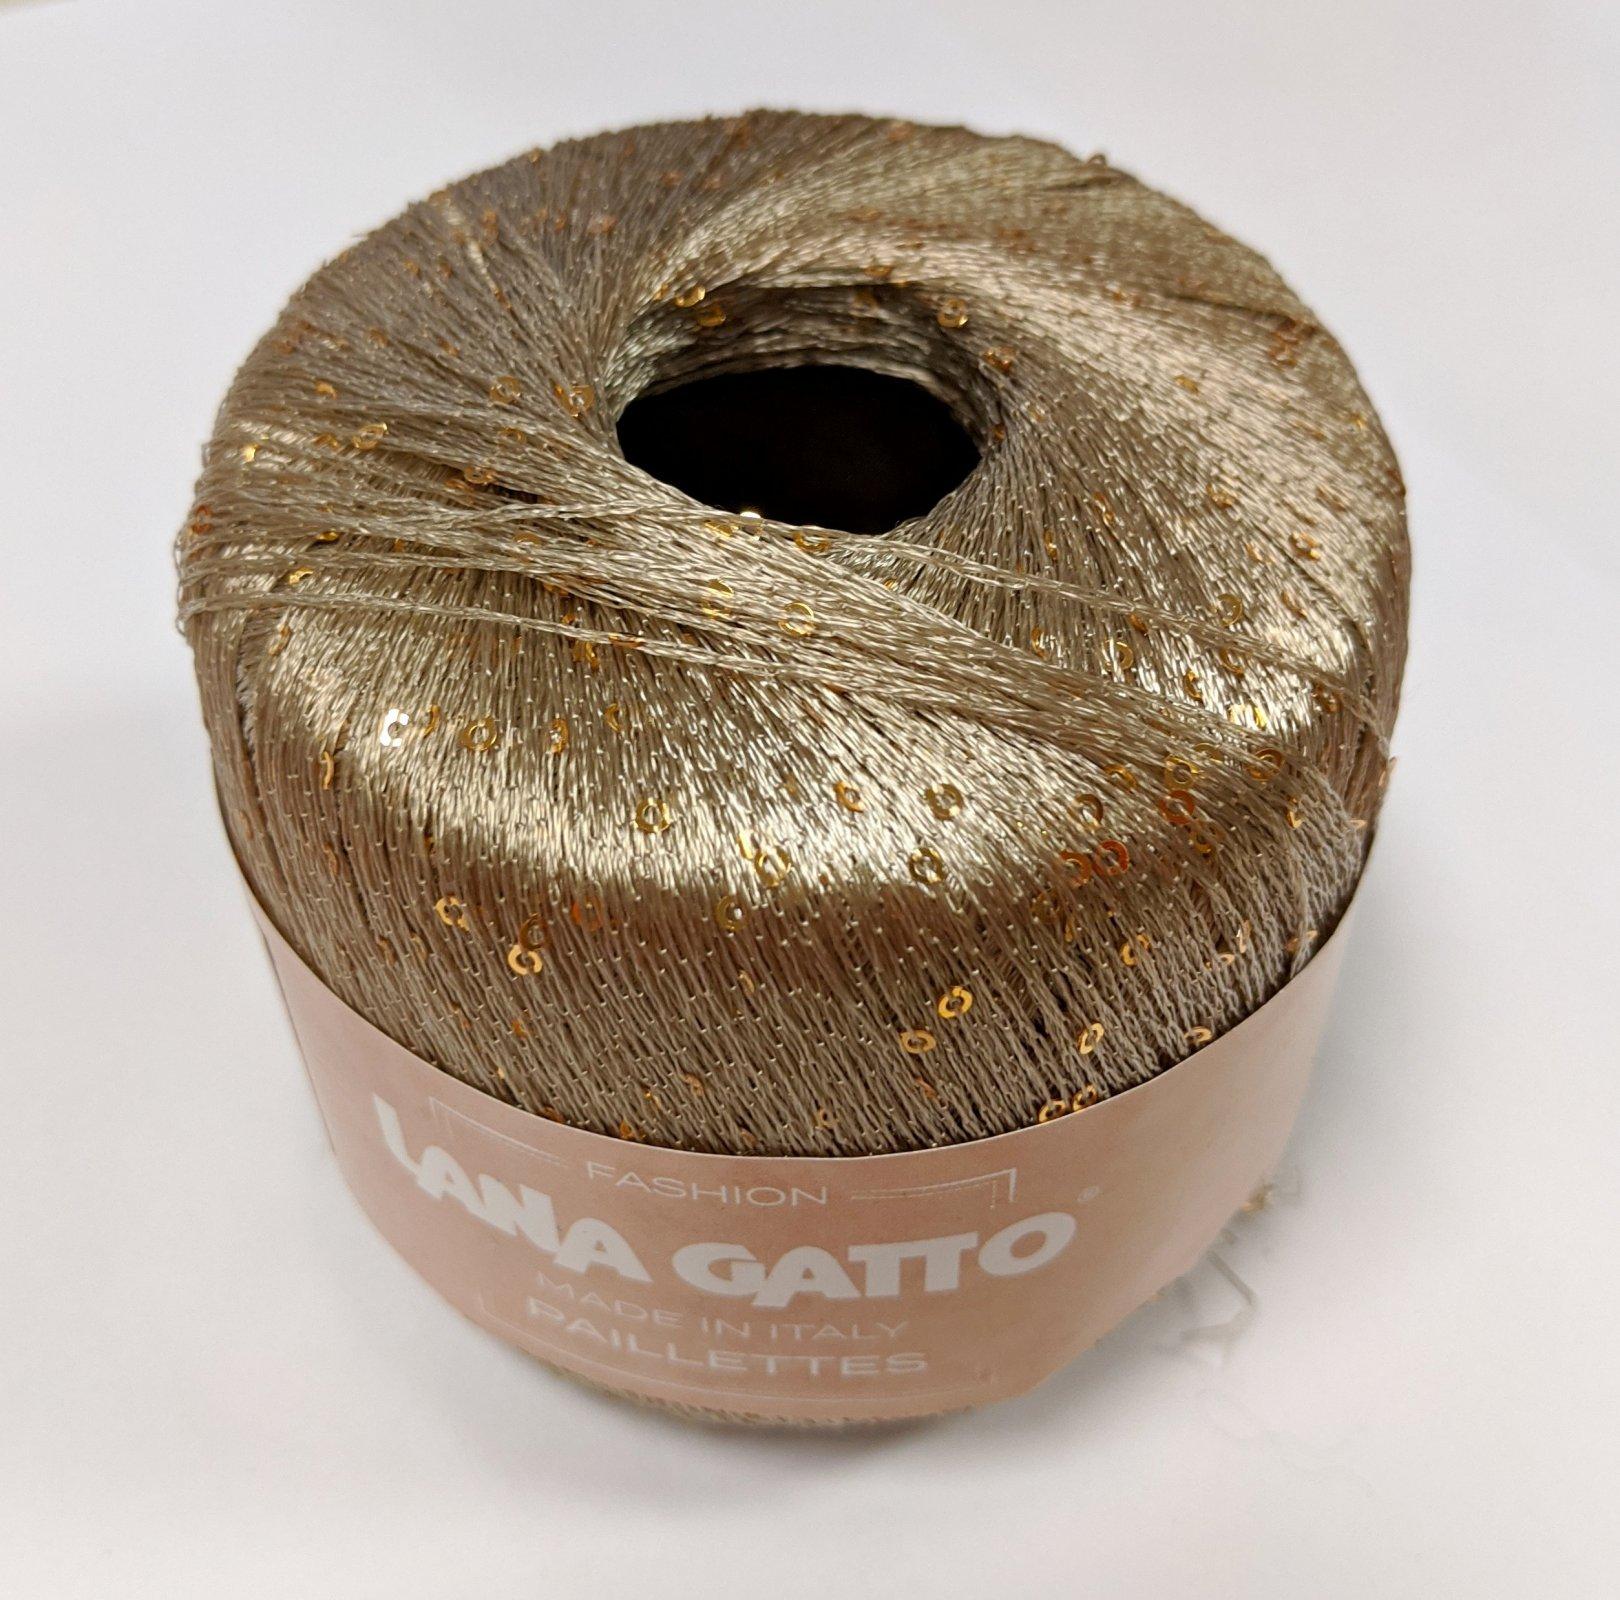 Lana Gatto Paillettes Yarn - Tan #8600